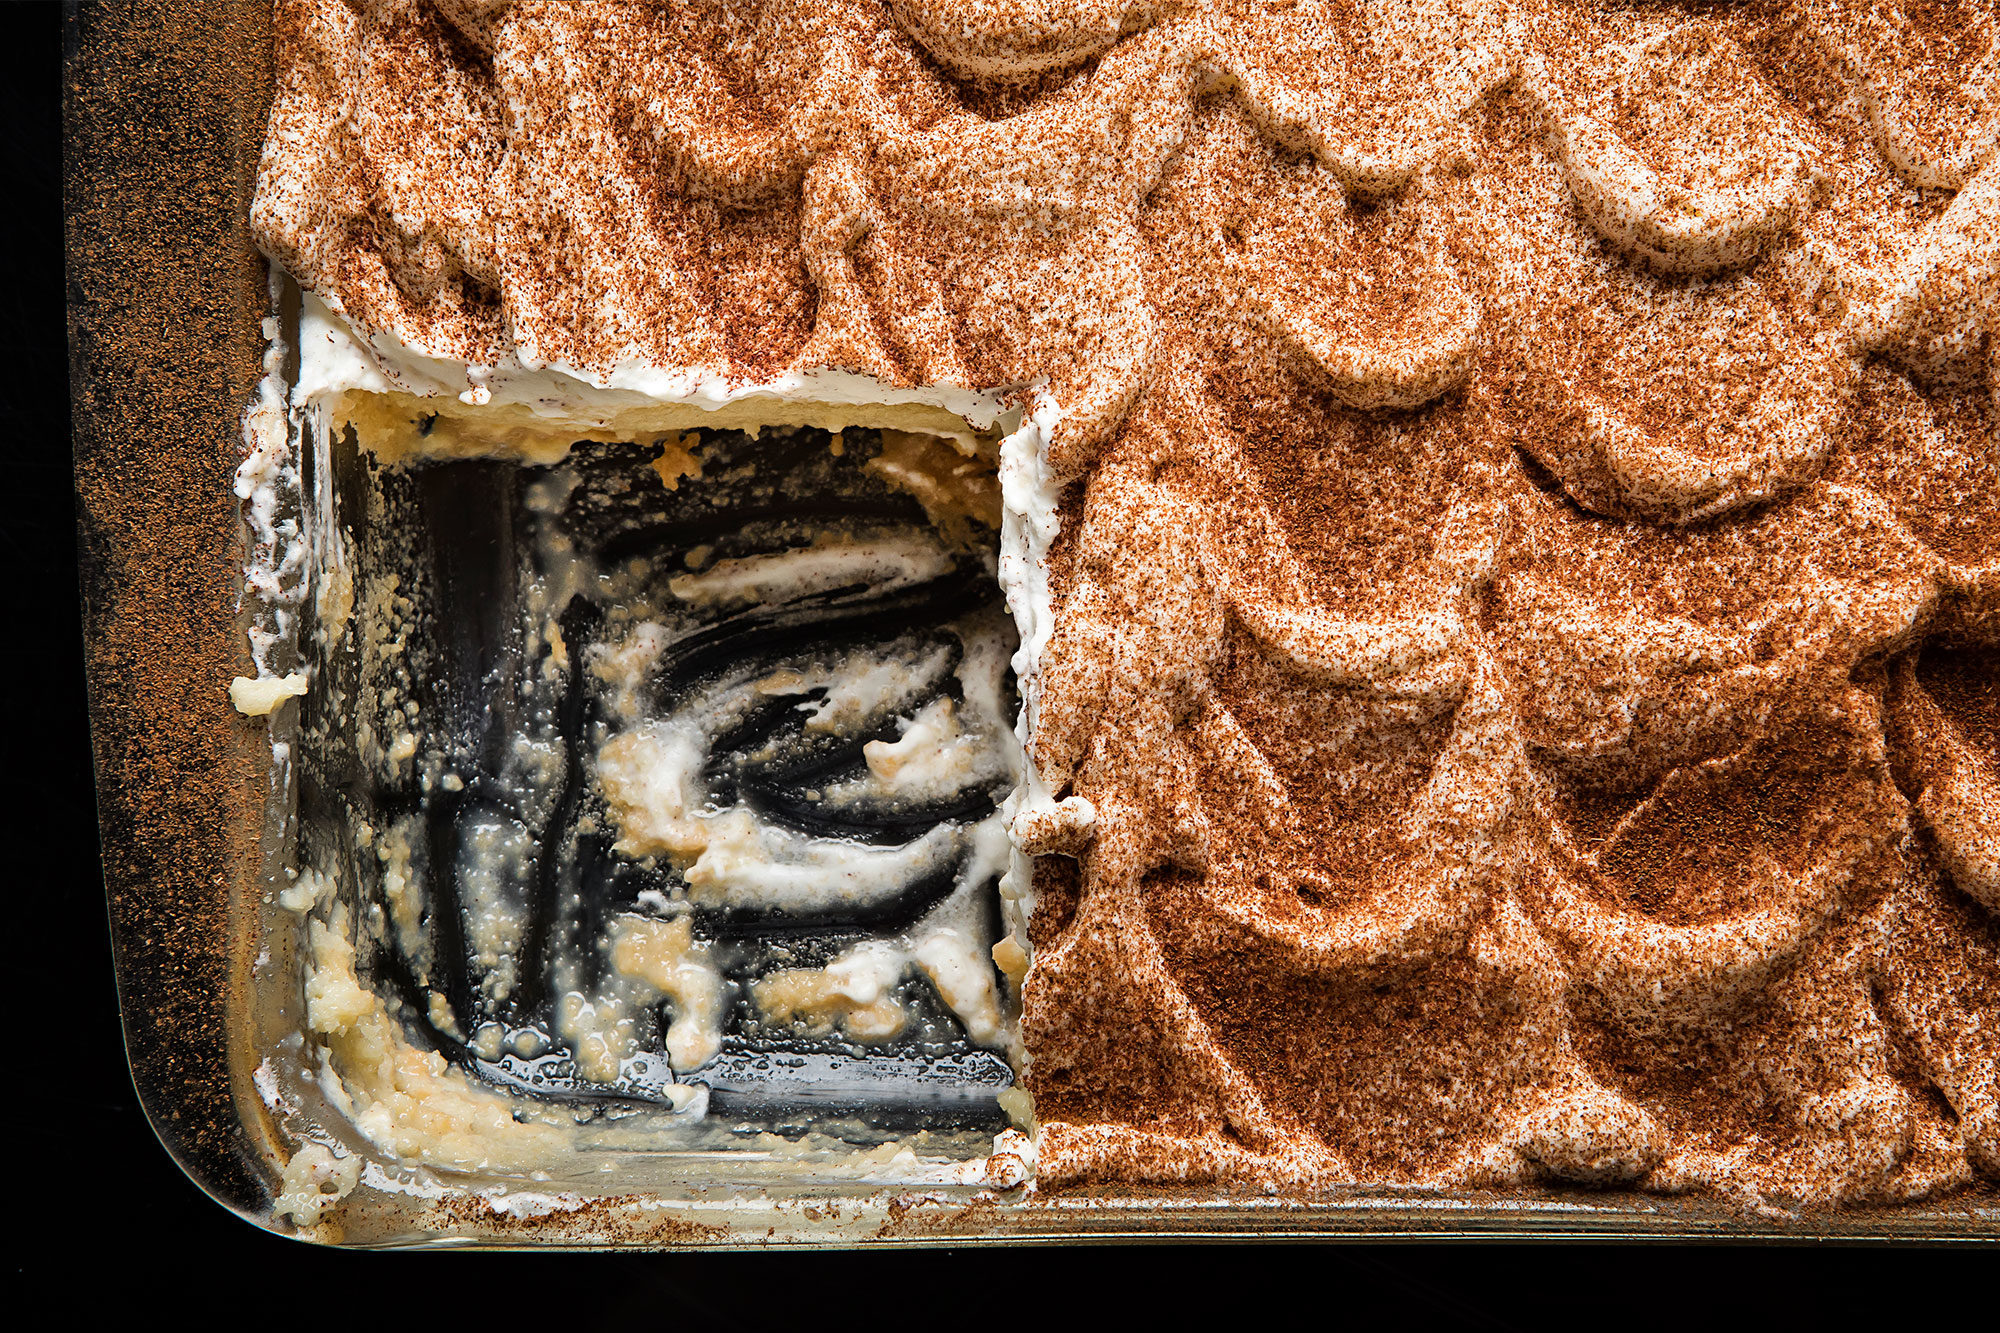 Article-Coconut-Tres-Leches-Cake-Easy-Dessert-Recipe